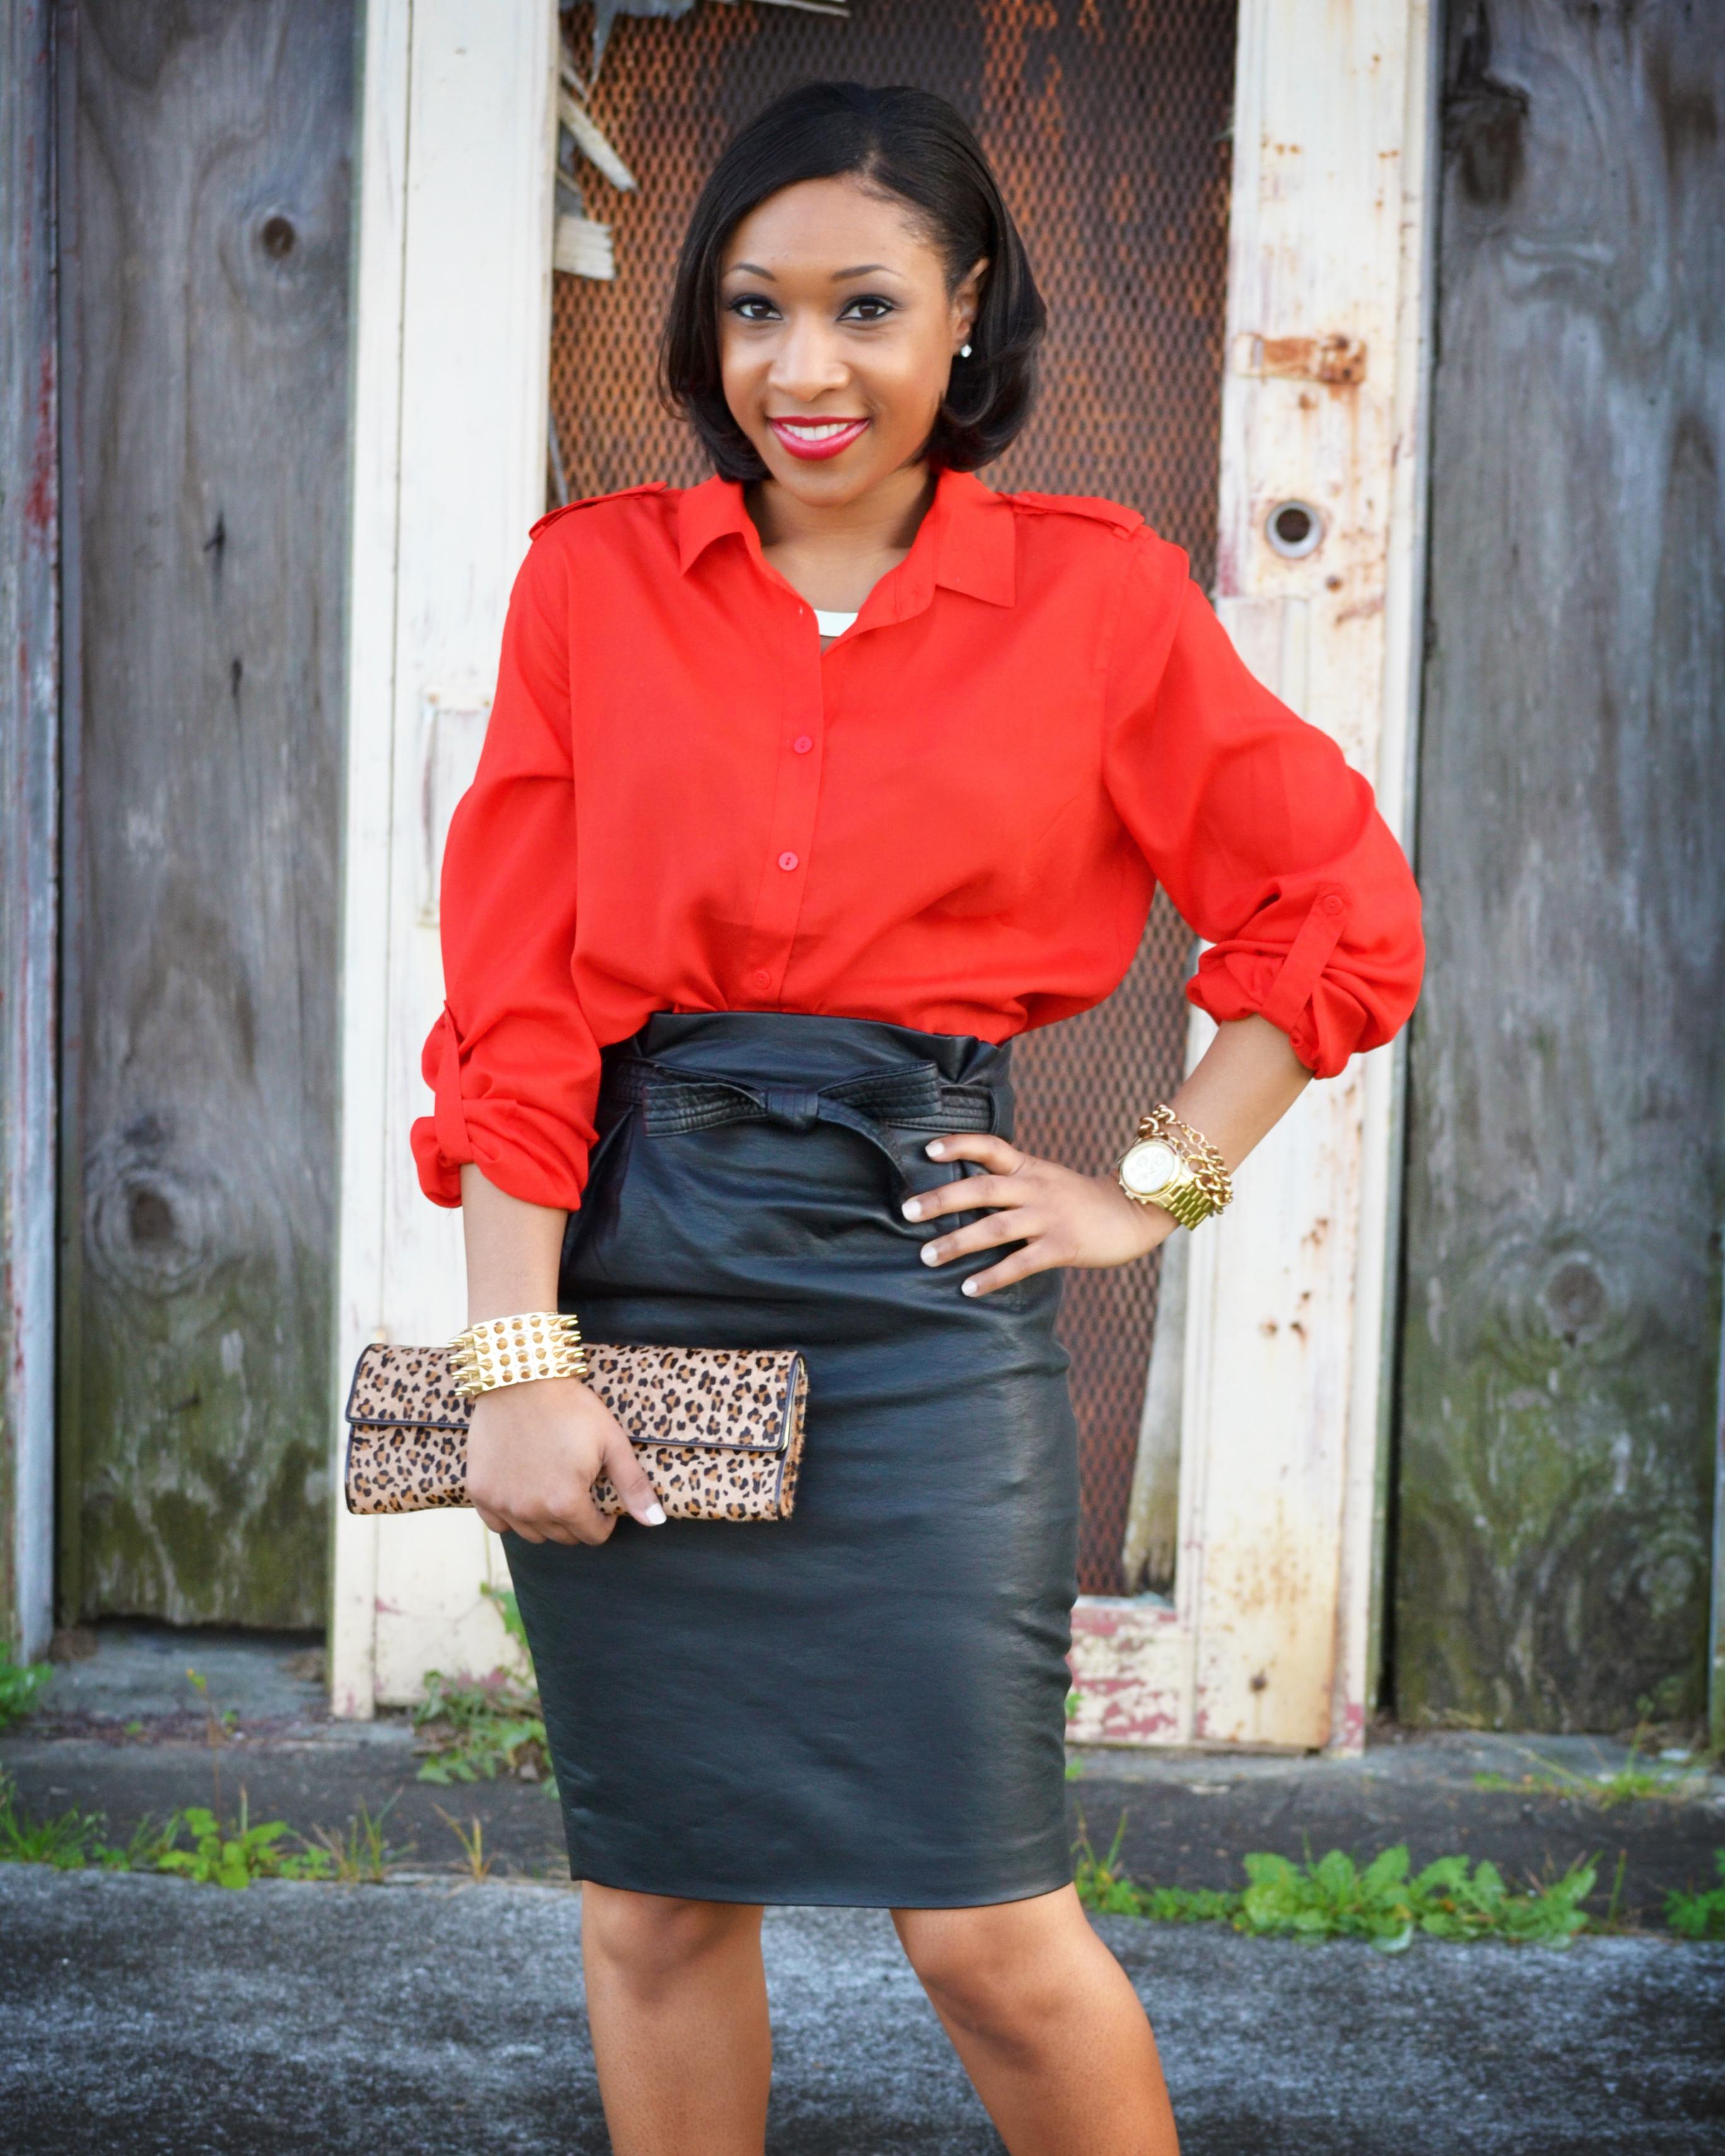 Southern Fashion – Good Morning Loretta